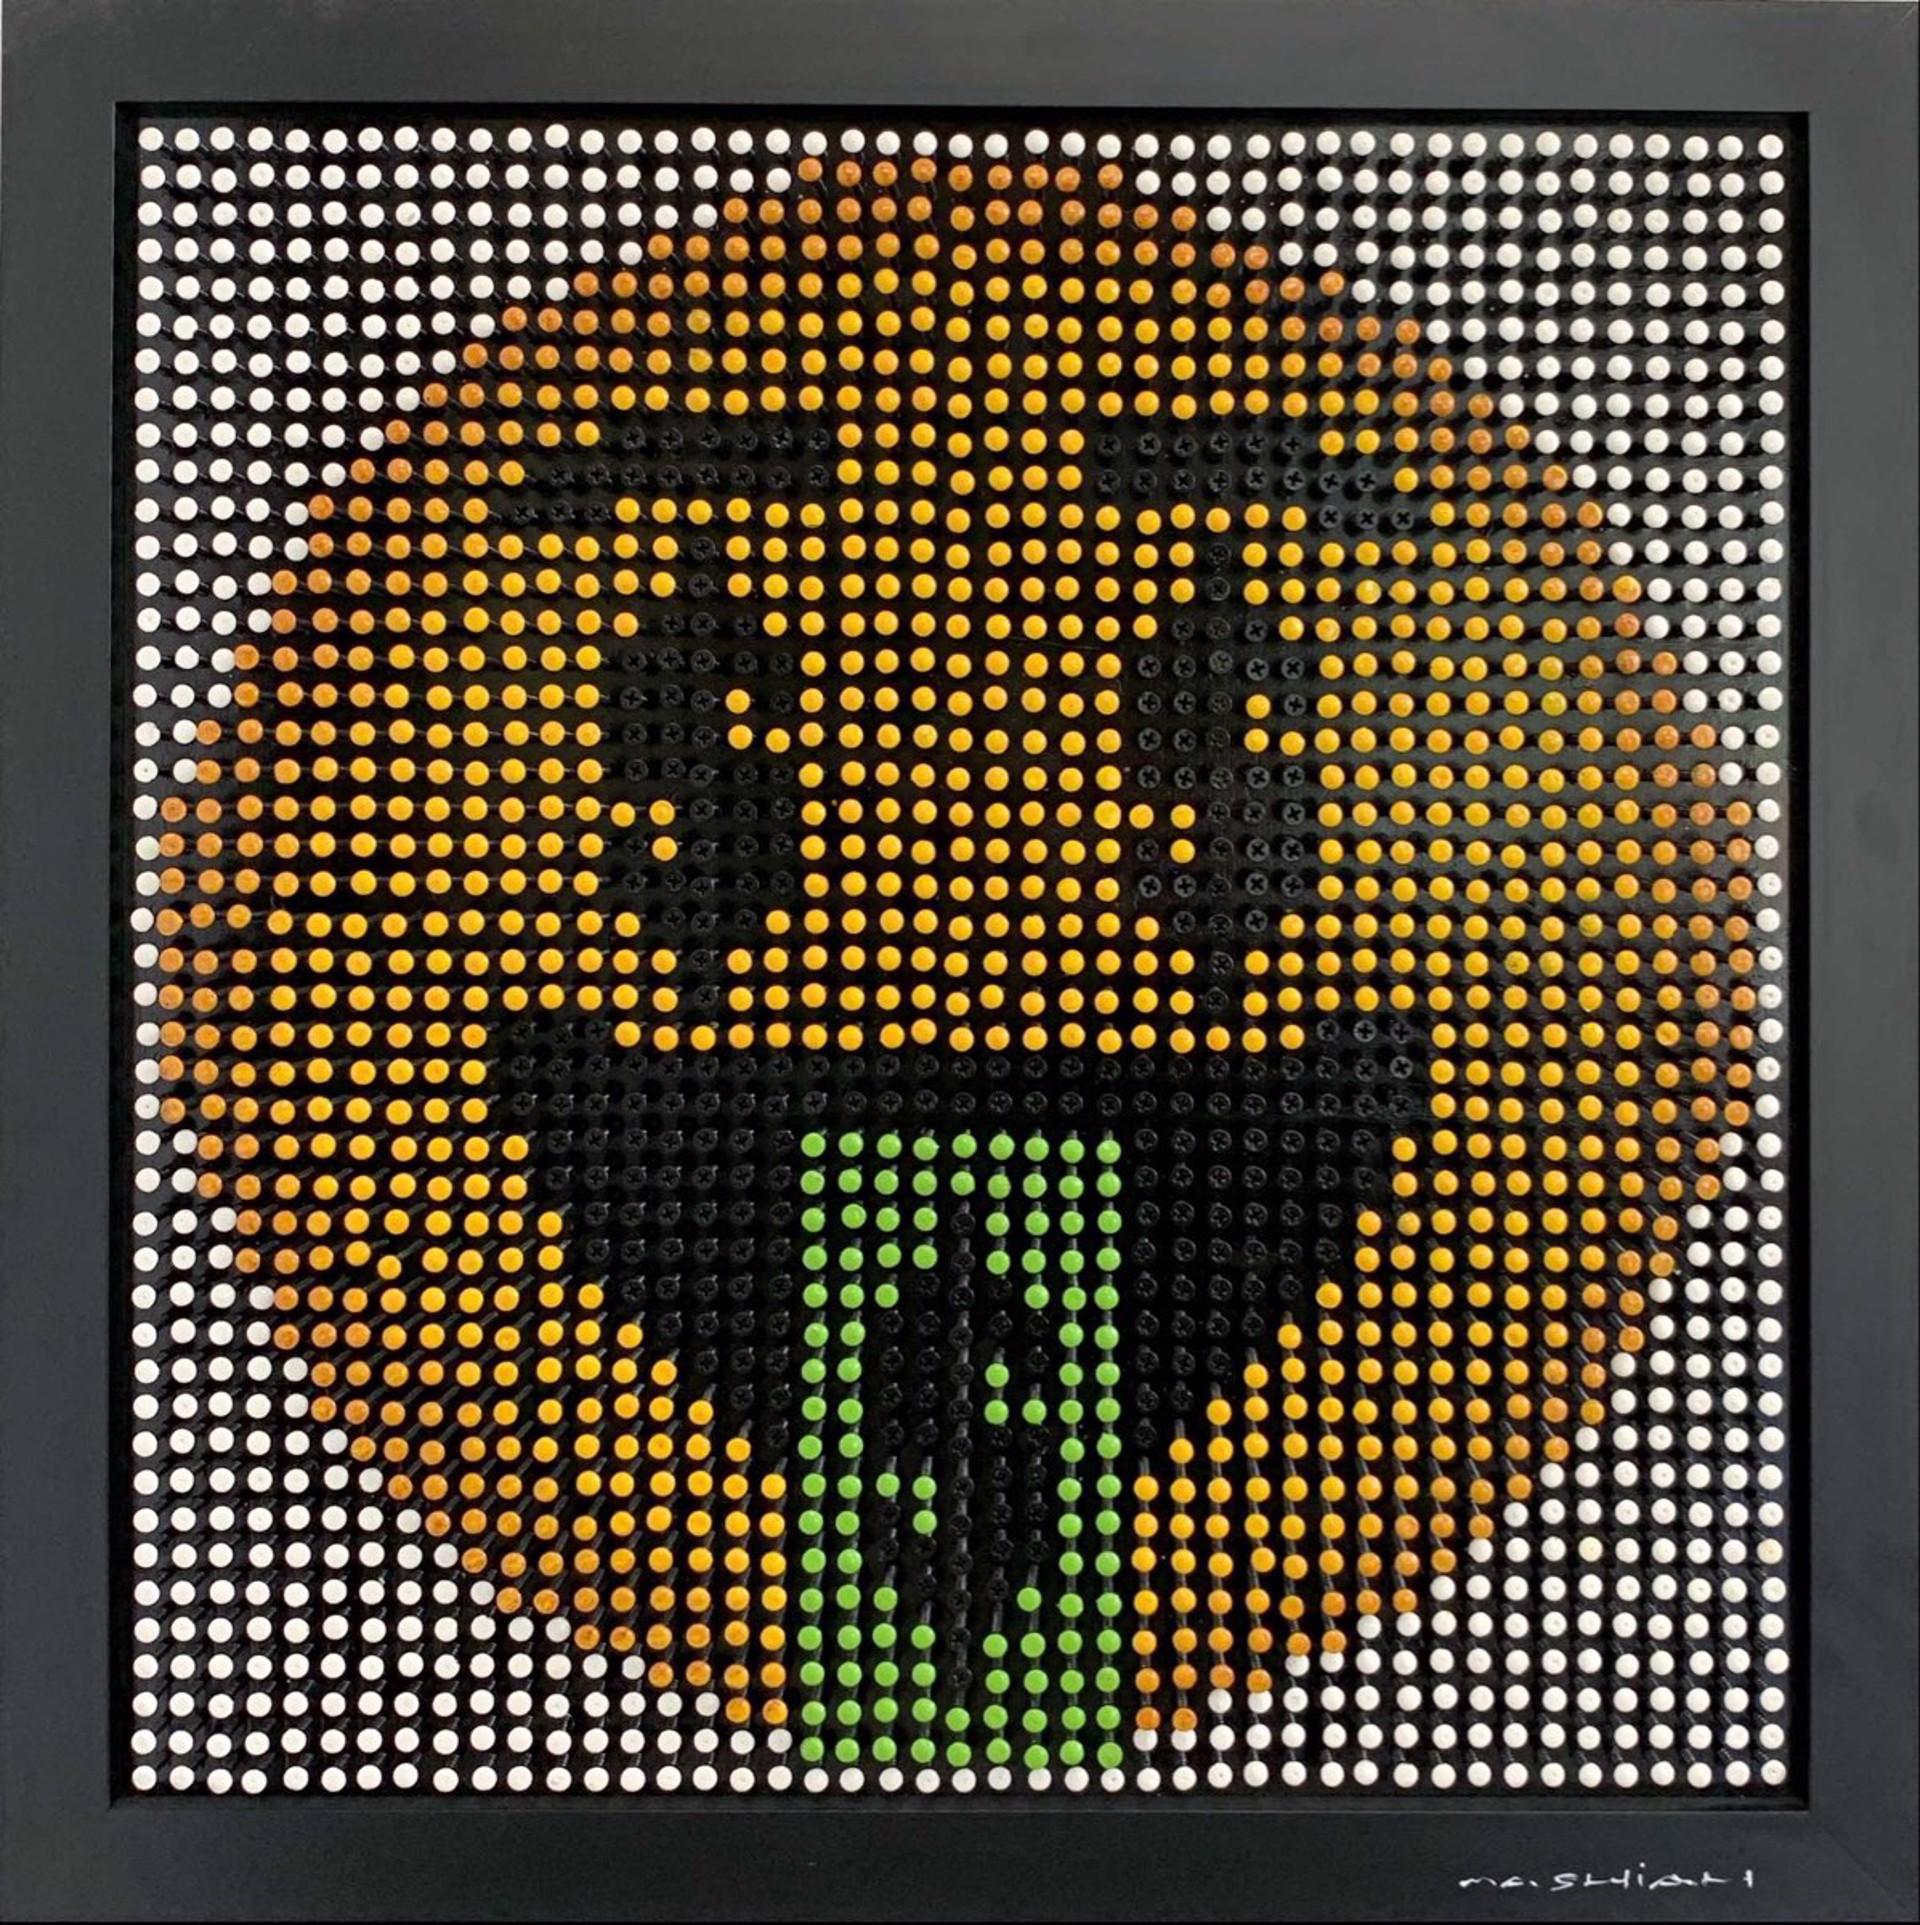 Emoji Screw Series - Money-Mouth Face by Efi Mashiah